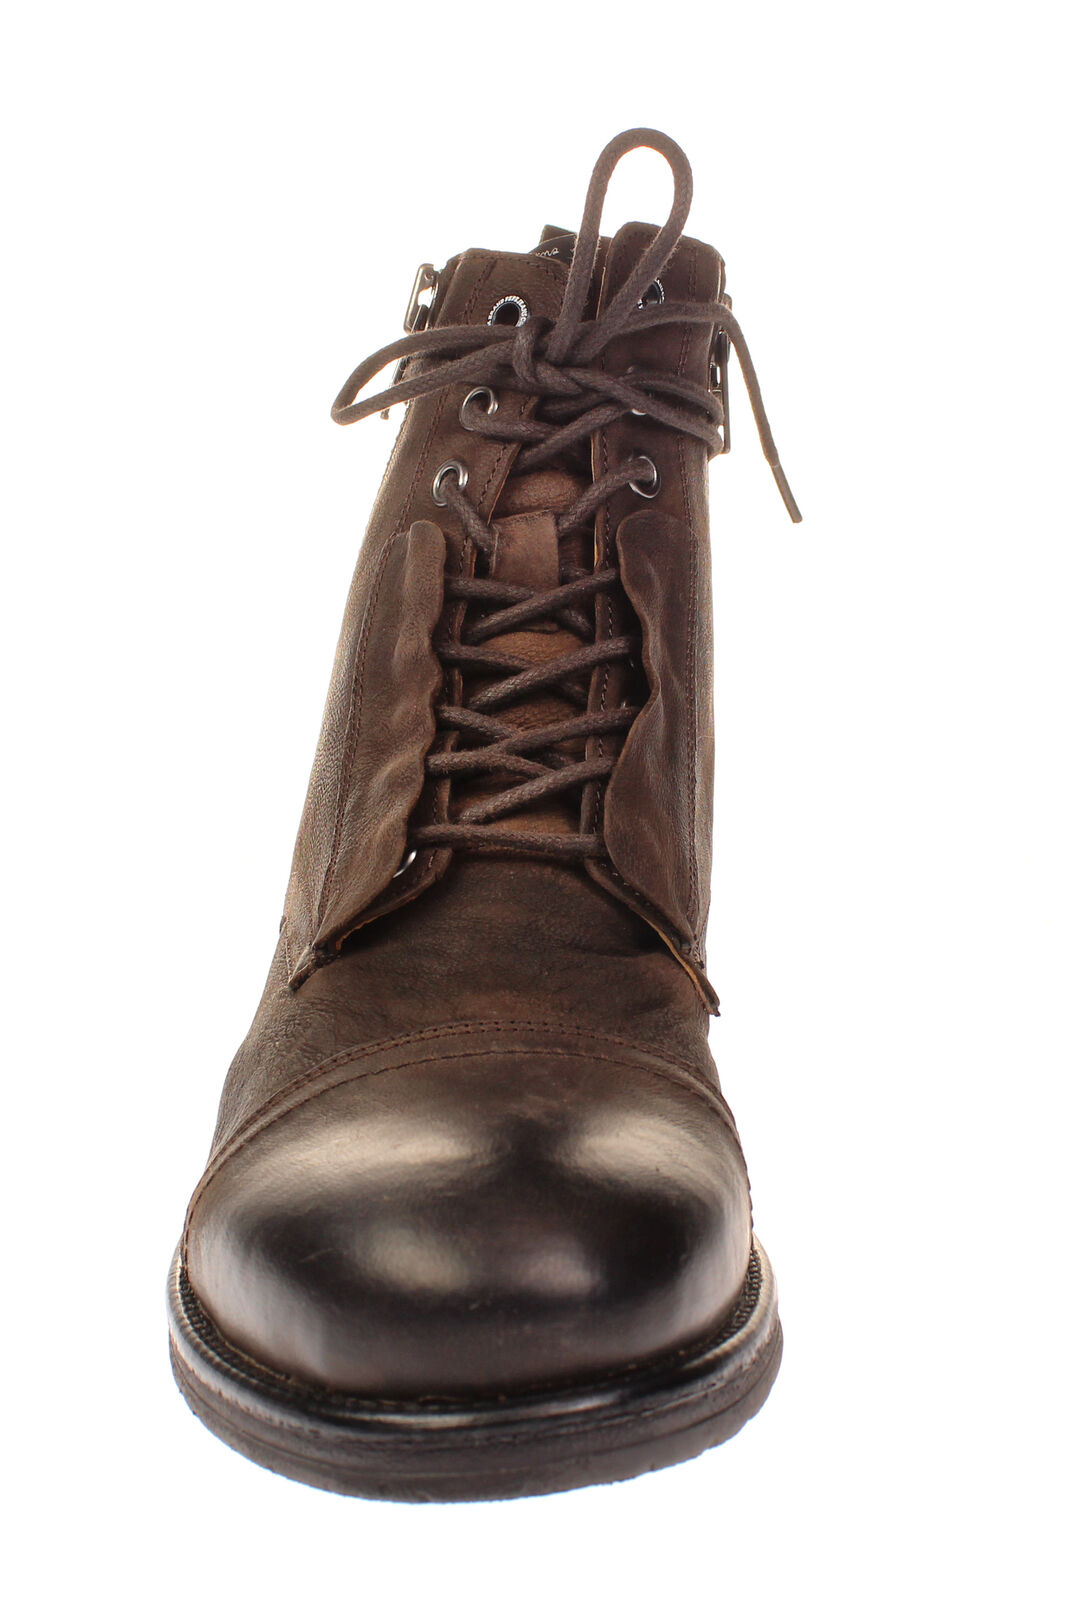 Chaussures Footwear Hommes Cut Pms50162 Pepe Boots Tom Boot SOgxqwwPfR